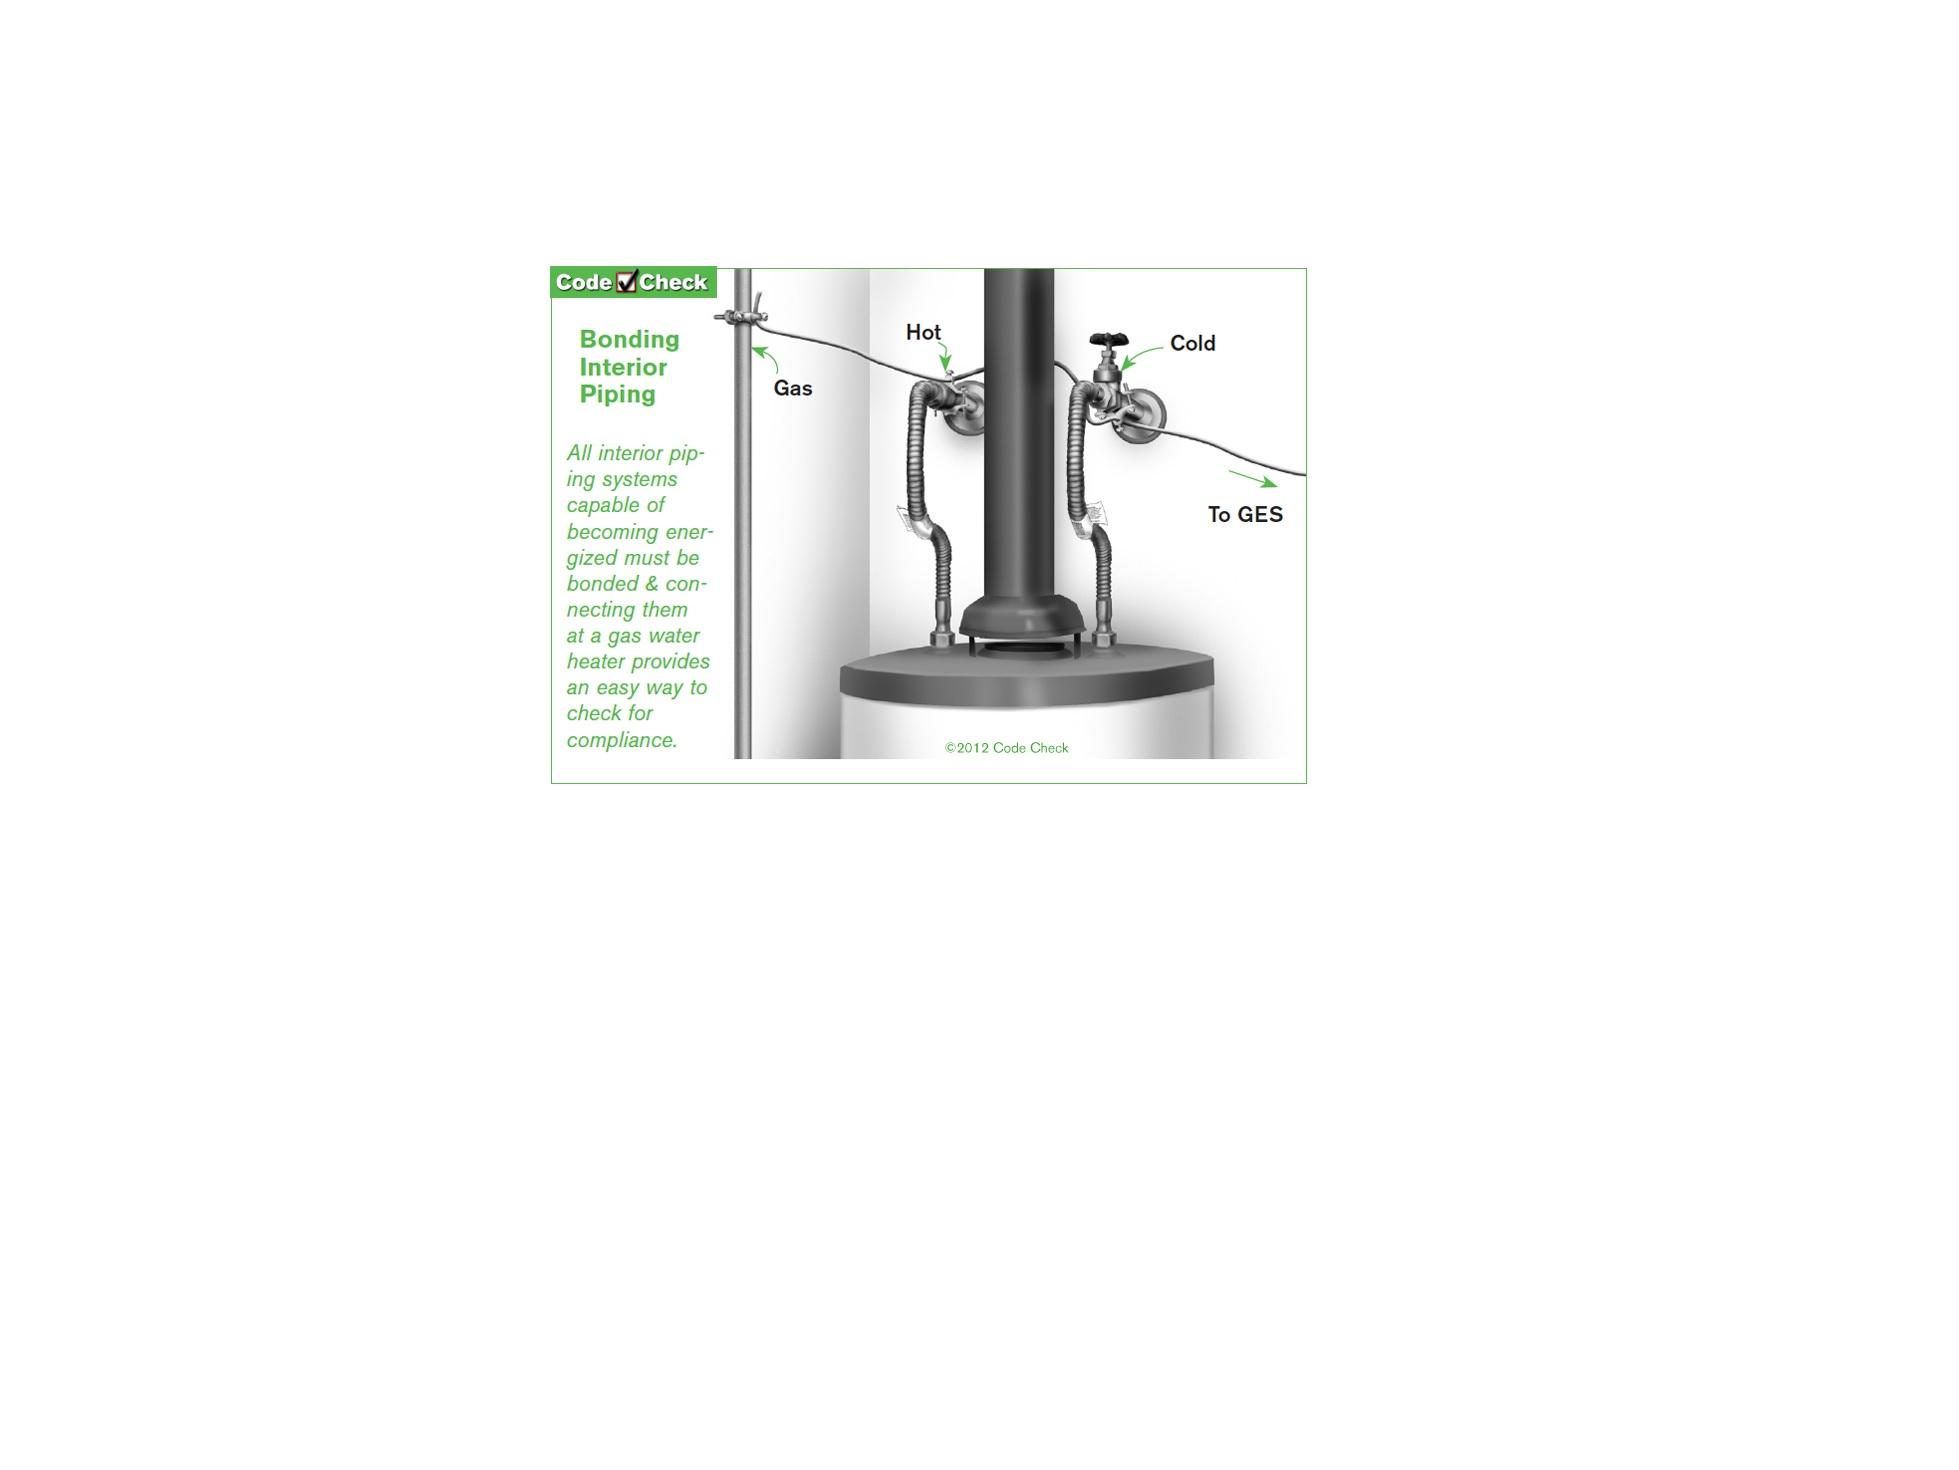 099b2b9c-5474-4e04-9ef3-19b2073c285b_Water Heater Bonding.jpg